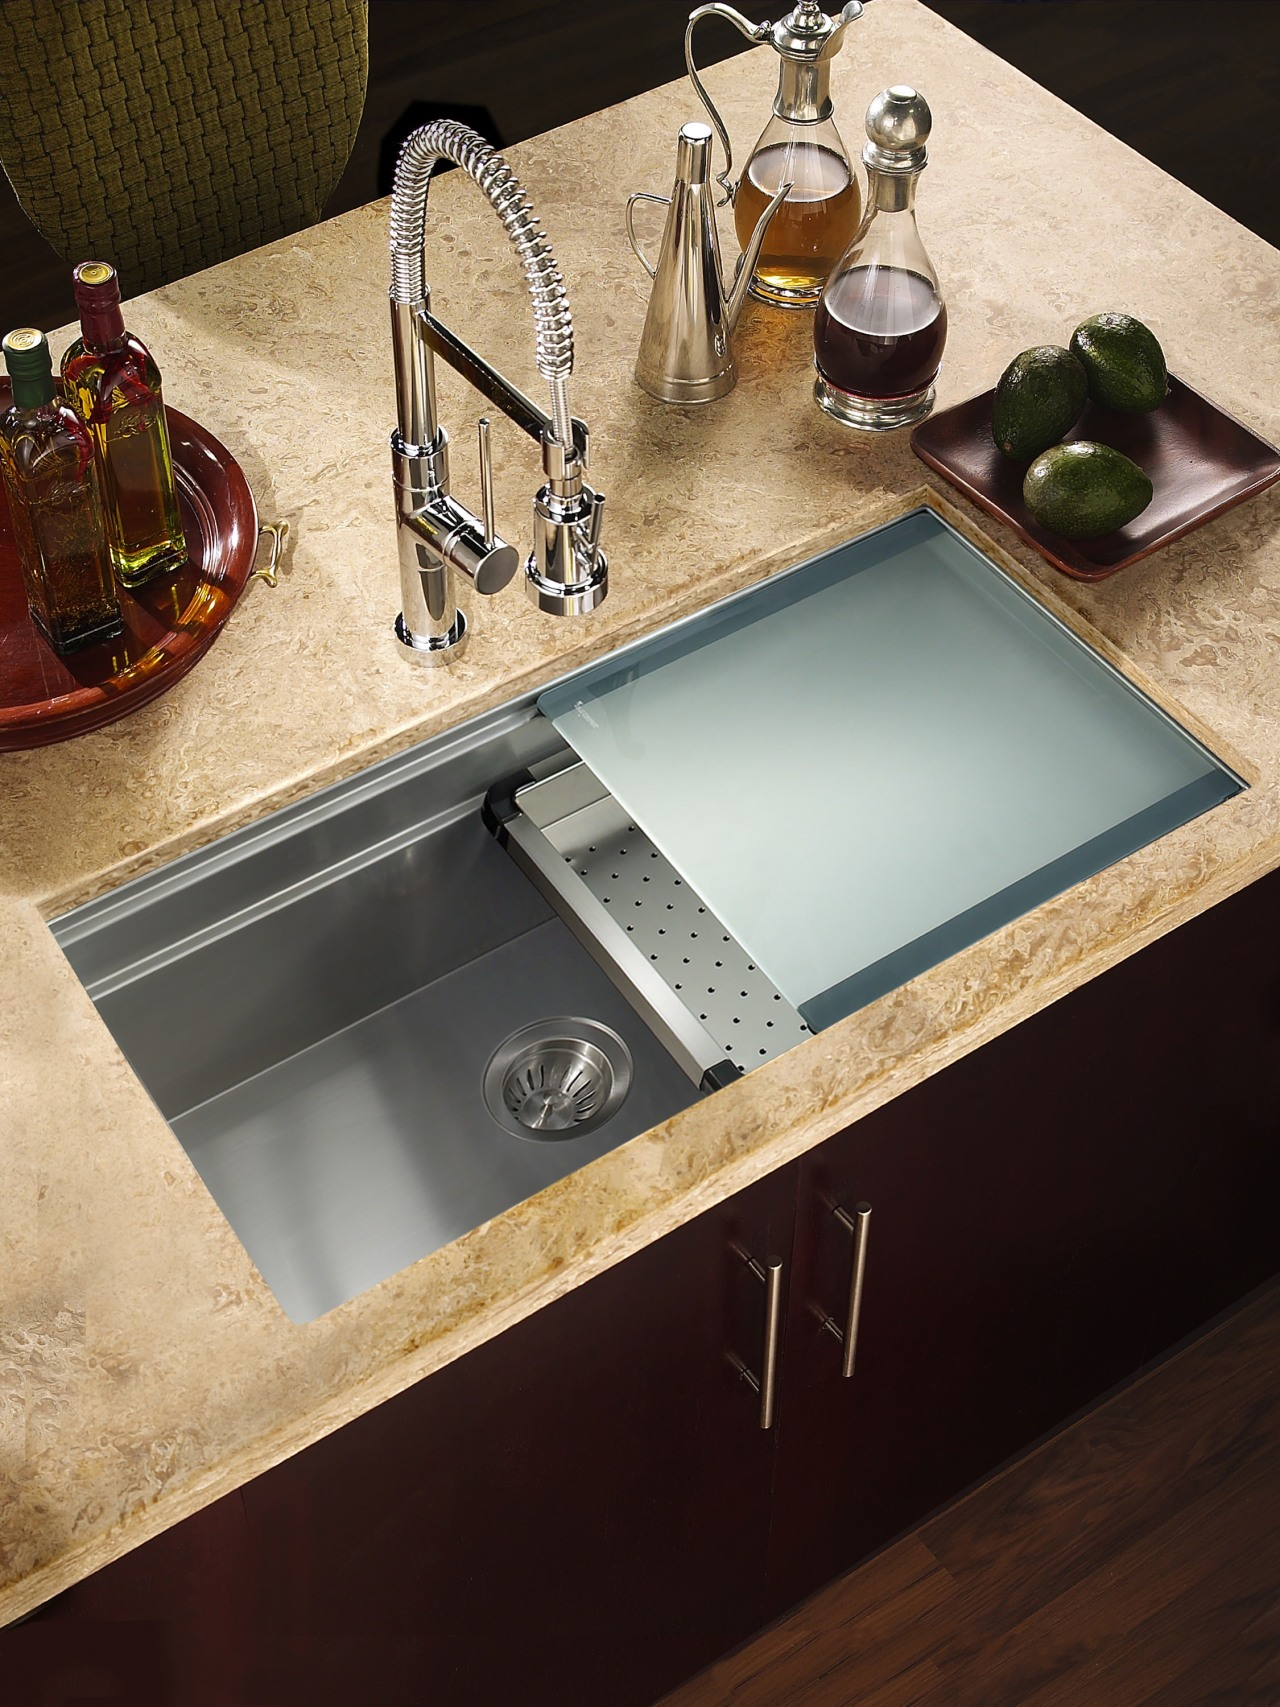 Houzer sinks come with sliding cutting boards can bathroom sink, countertop, plumbing fixture, sink, tap, black, orange